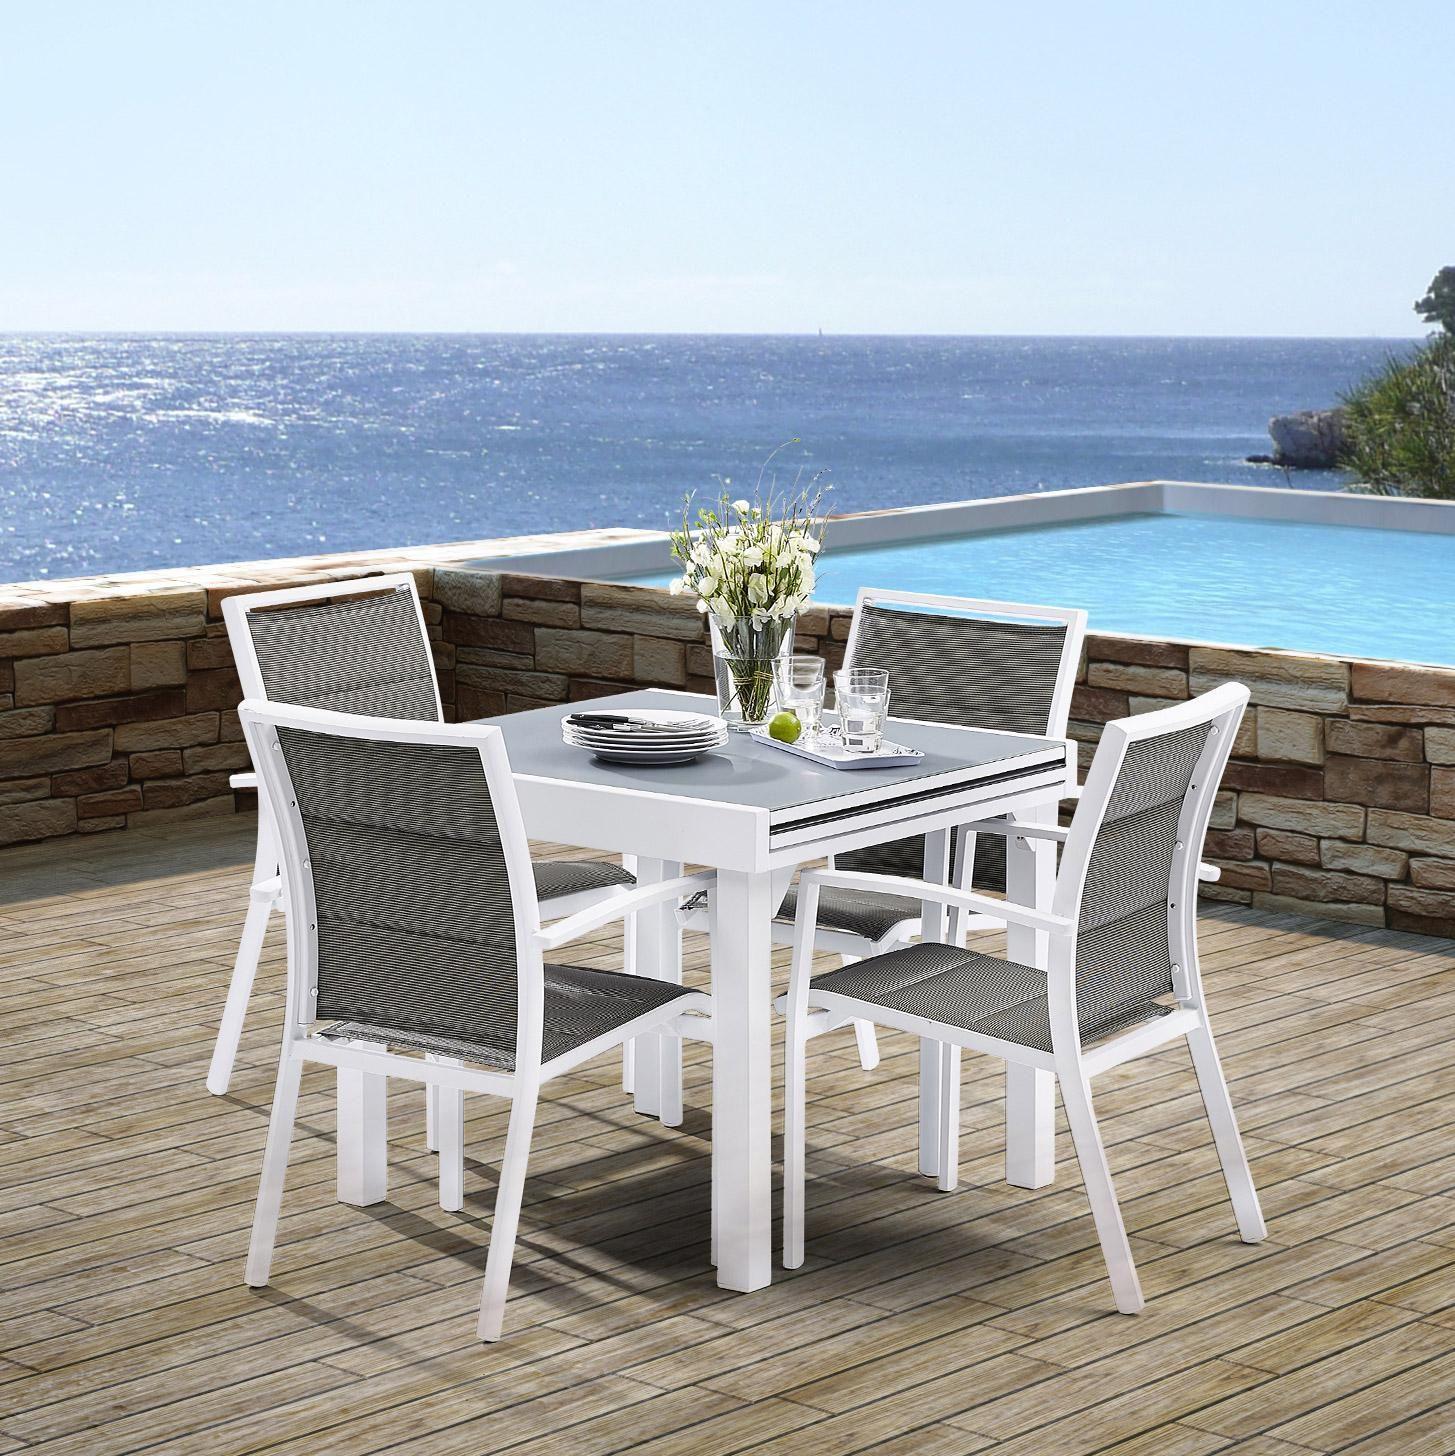 Salon de jardin Wilsa modulo t4/8 aluminium blanc, 4 ...